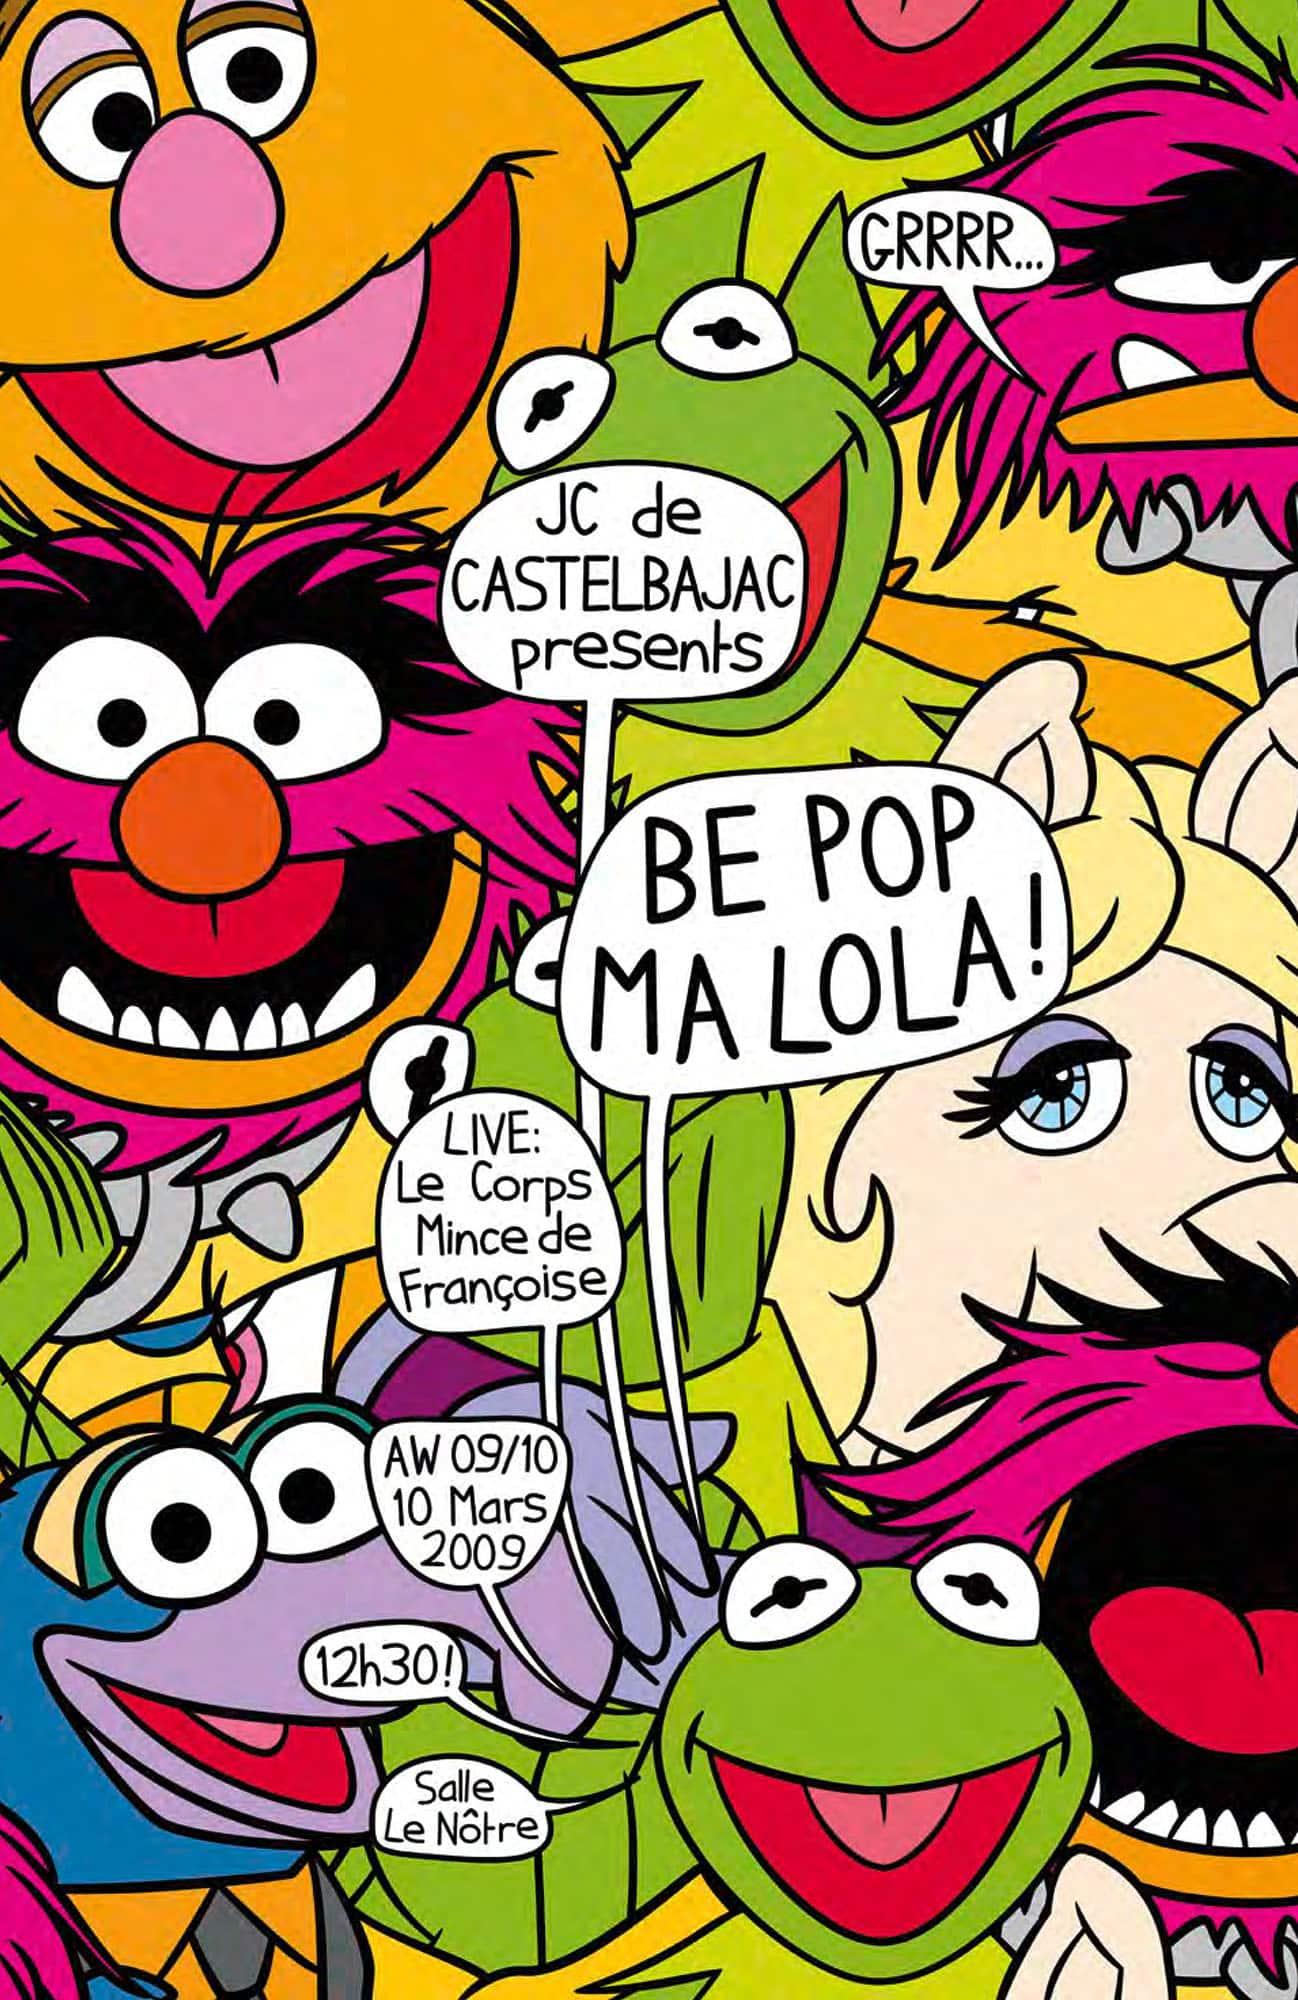 JC de Castelbajac Winter 2009-2010. Be Pop Ma Lola Collection. RUNWAY MAGAZINE ® Collections. RUNWAY NOW / RUNWAY NEW